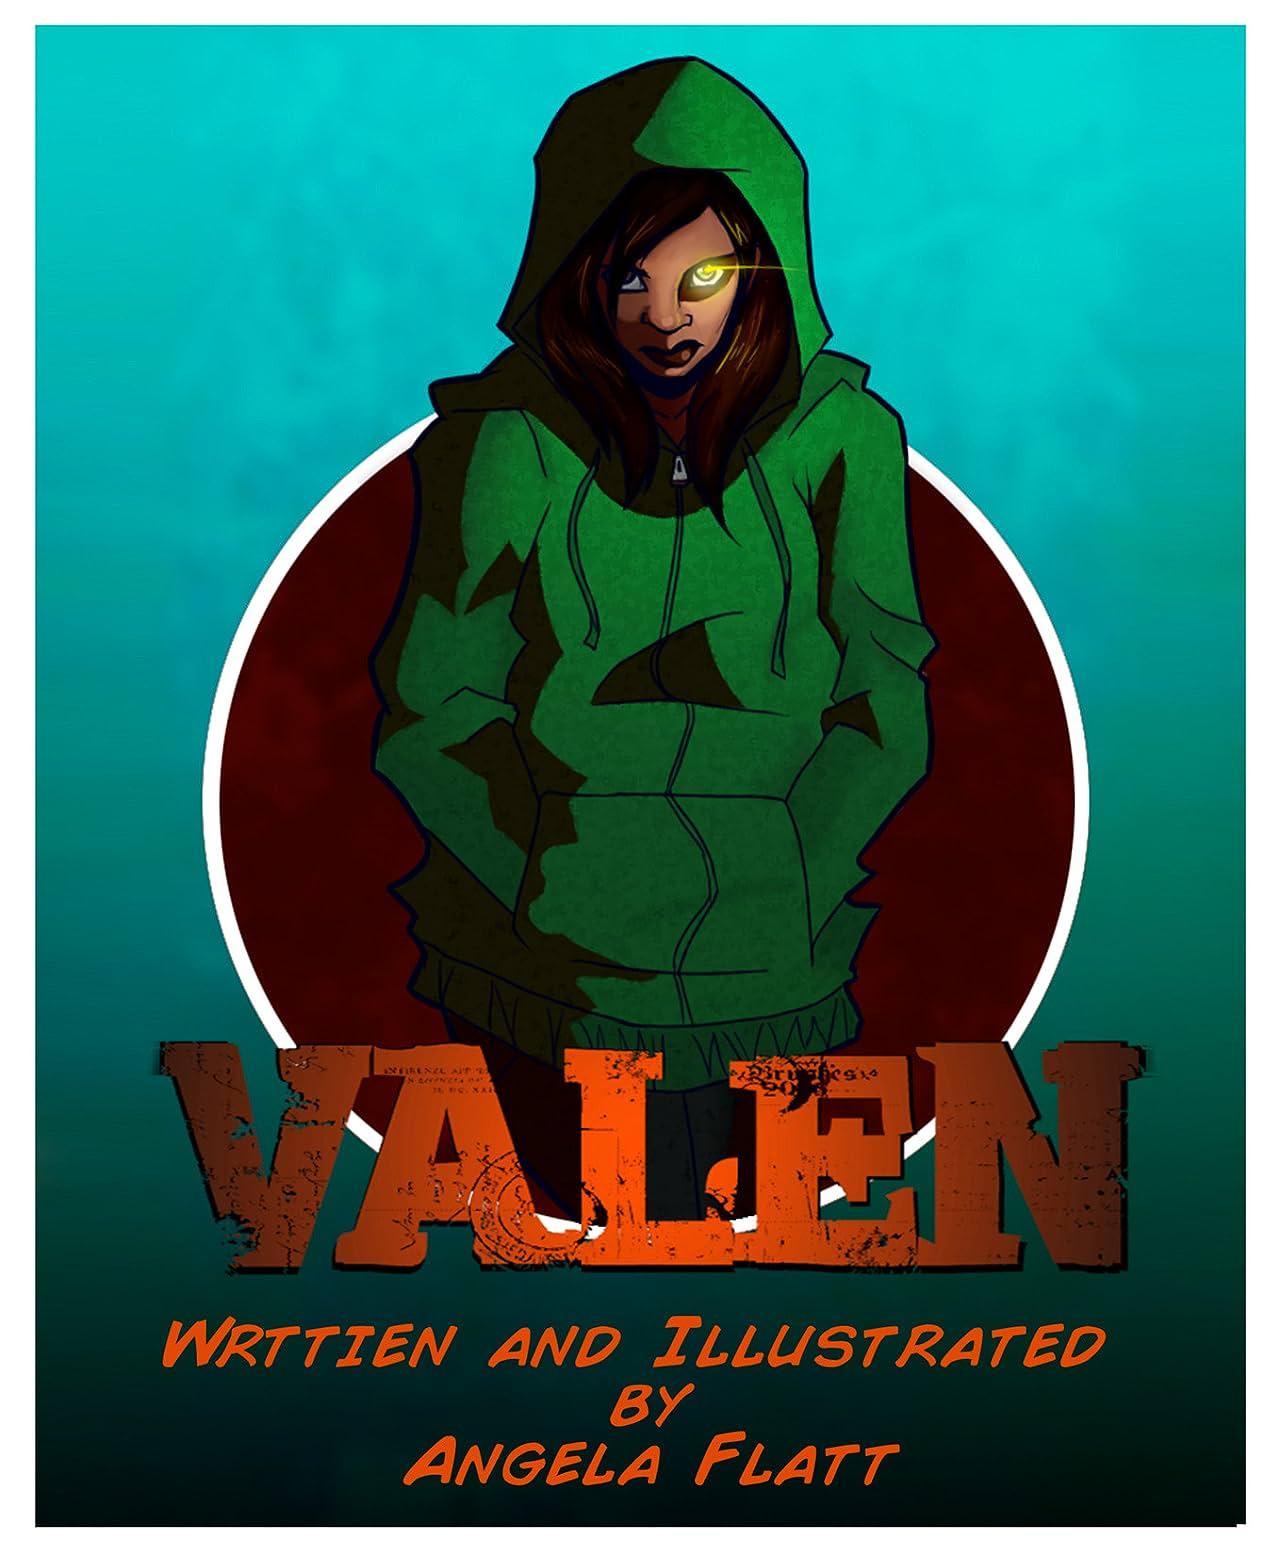 Valen Vol. 1: Monster Under the Bed